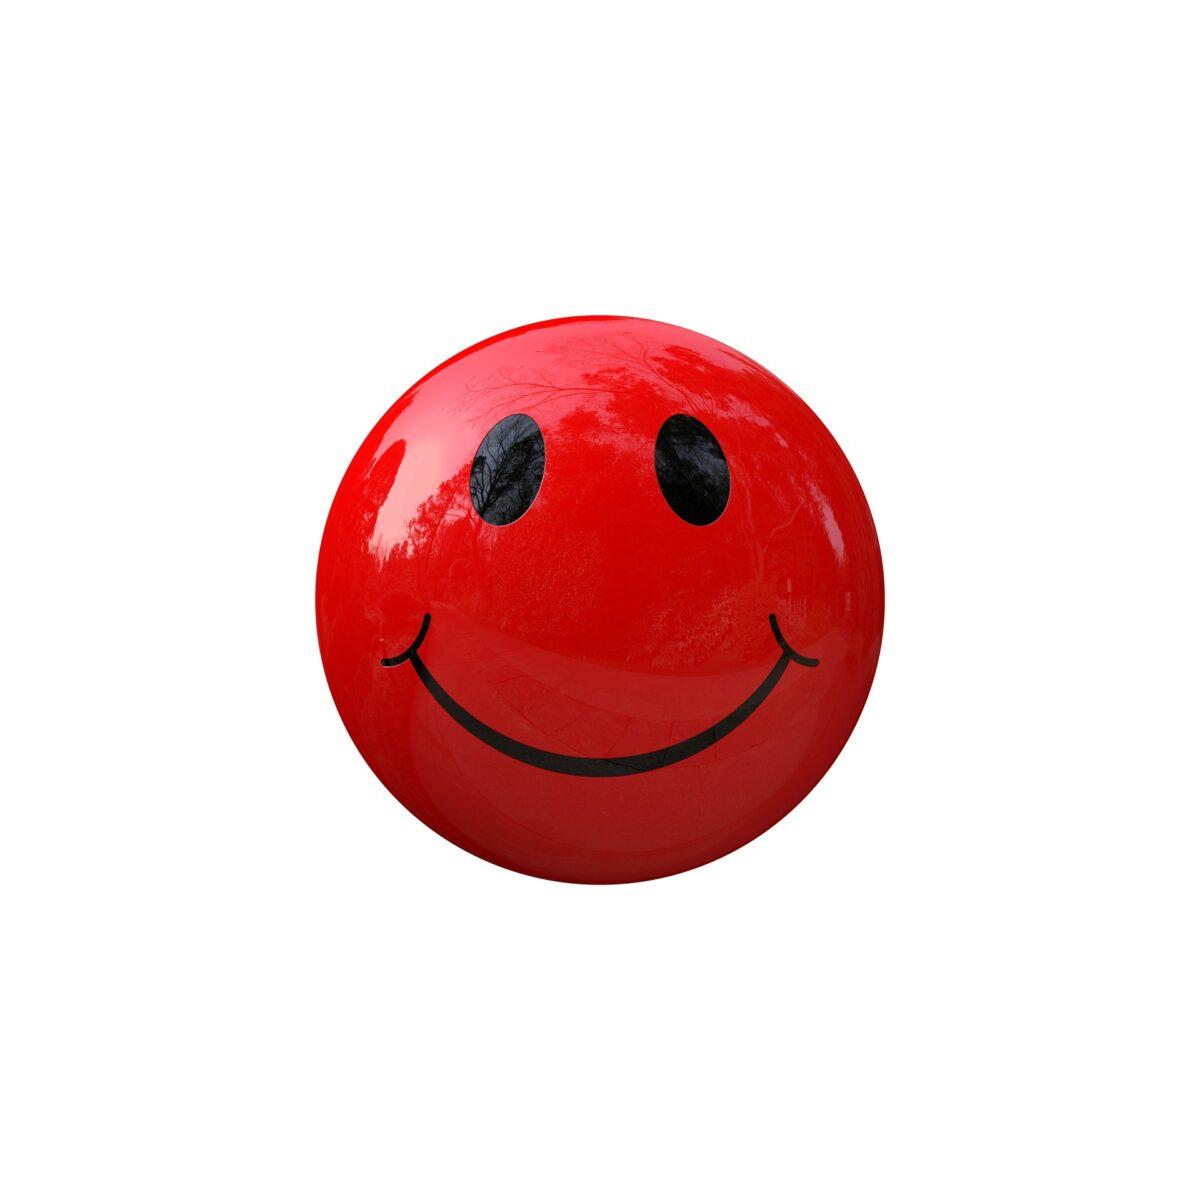 smiley-1020191_1920